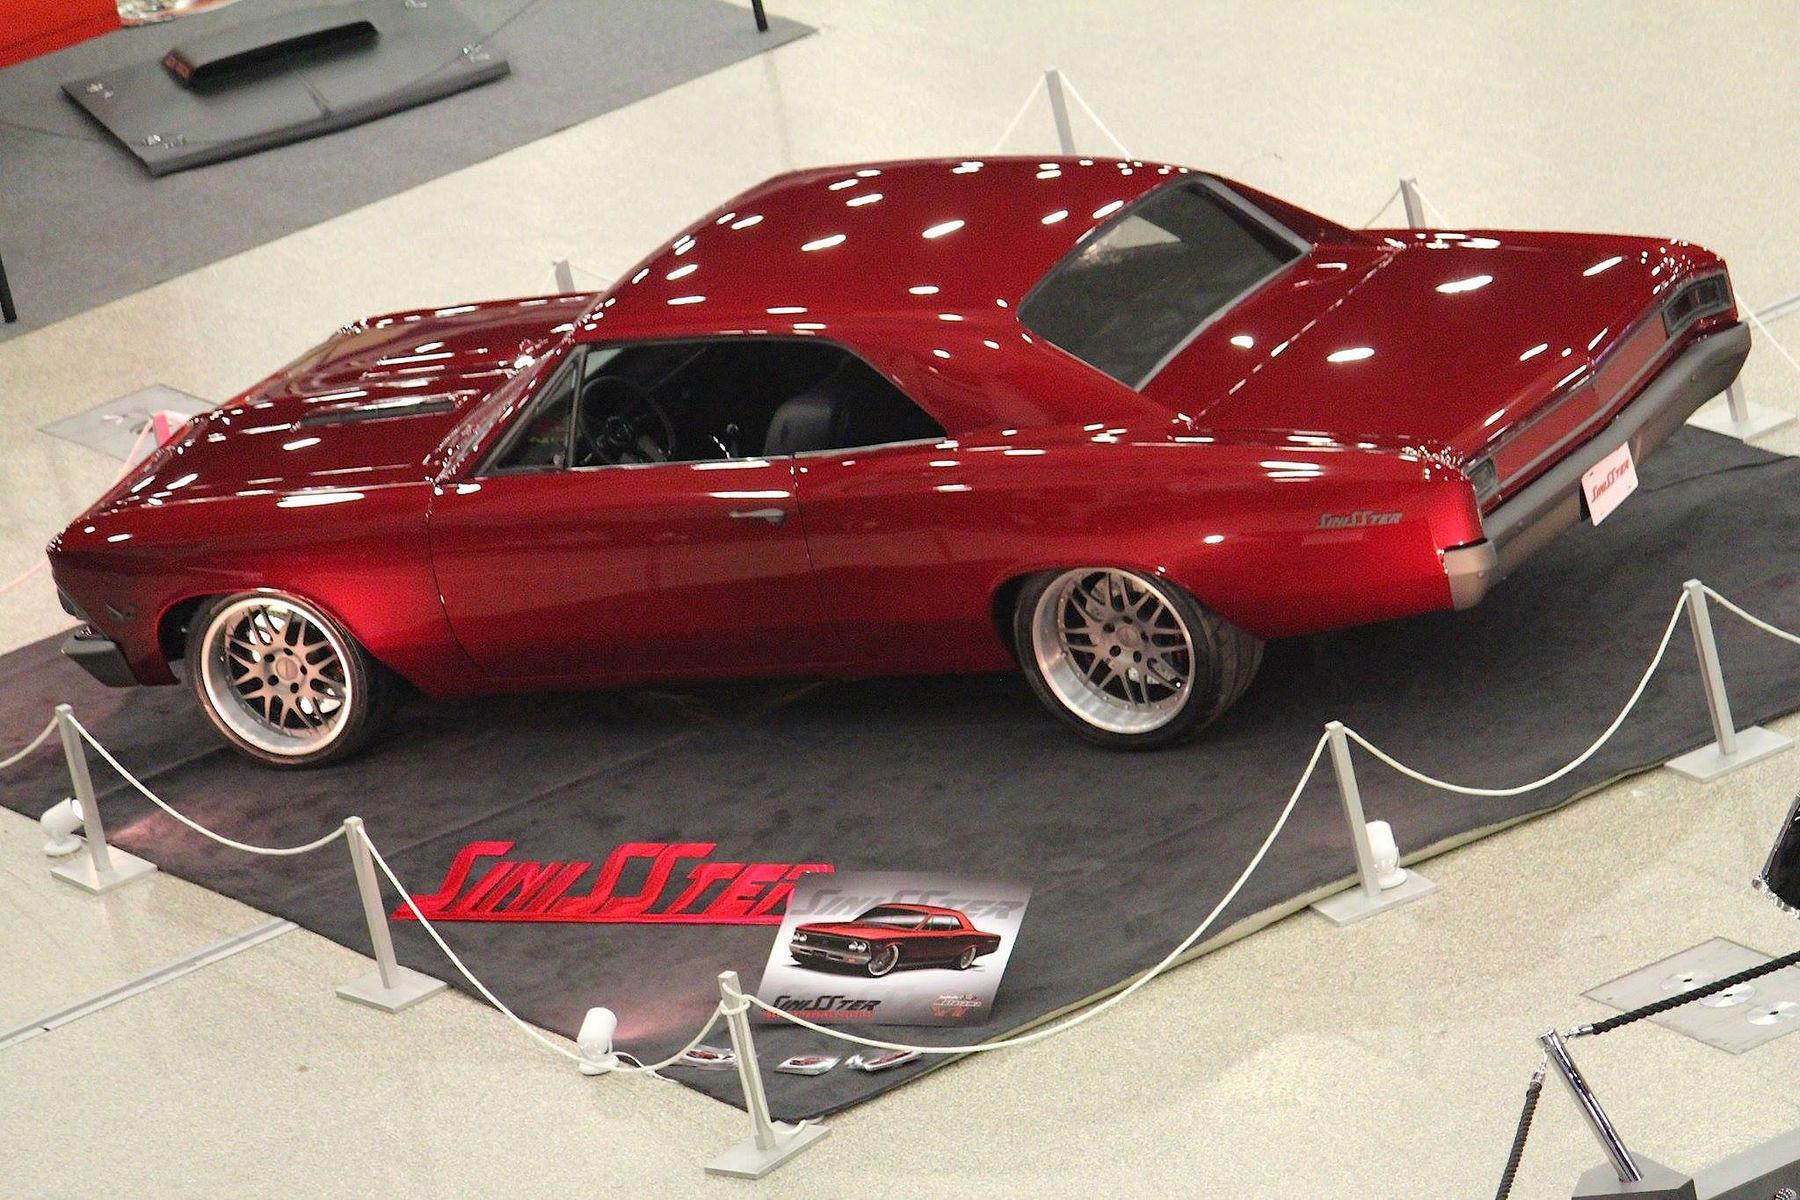 1966 Chevrolet Chevelle | Buffalo Motorama Project Chevelle, aka: SiniSSter on Forgeline DE3P Wheels